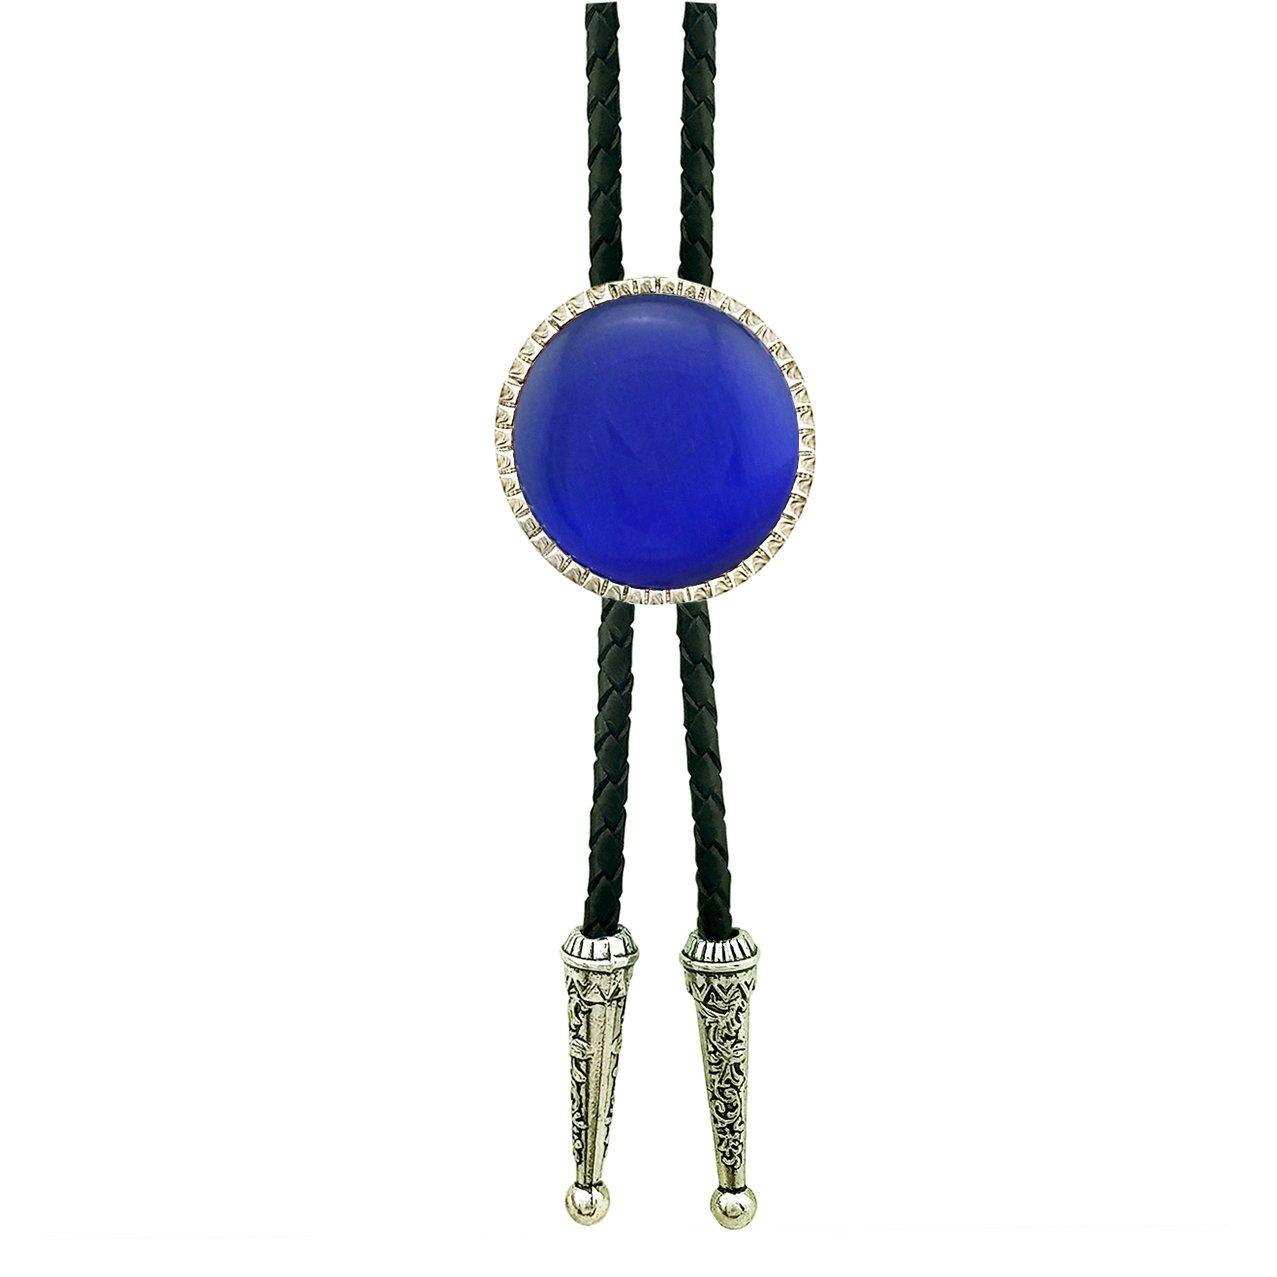 SELOVO Royal Blue Stone Rhinestone Genunie Leather Bolo Tie Silver Tone